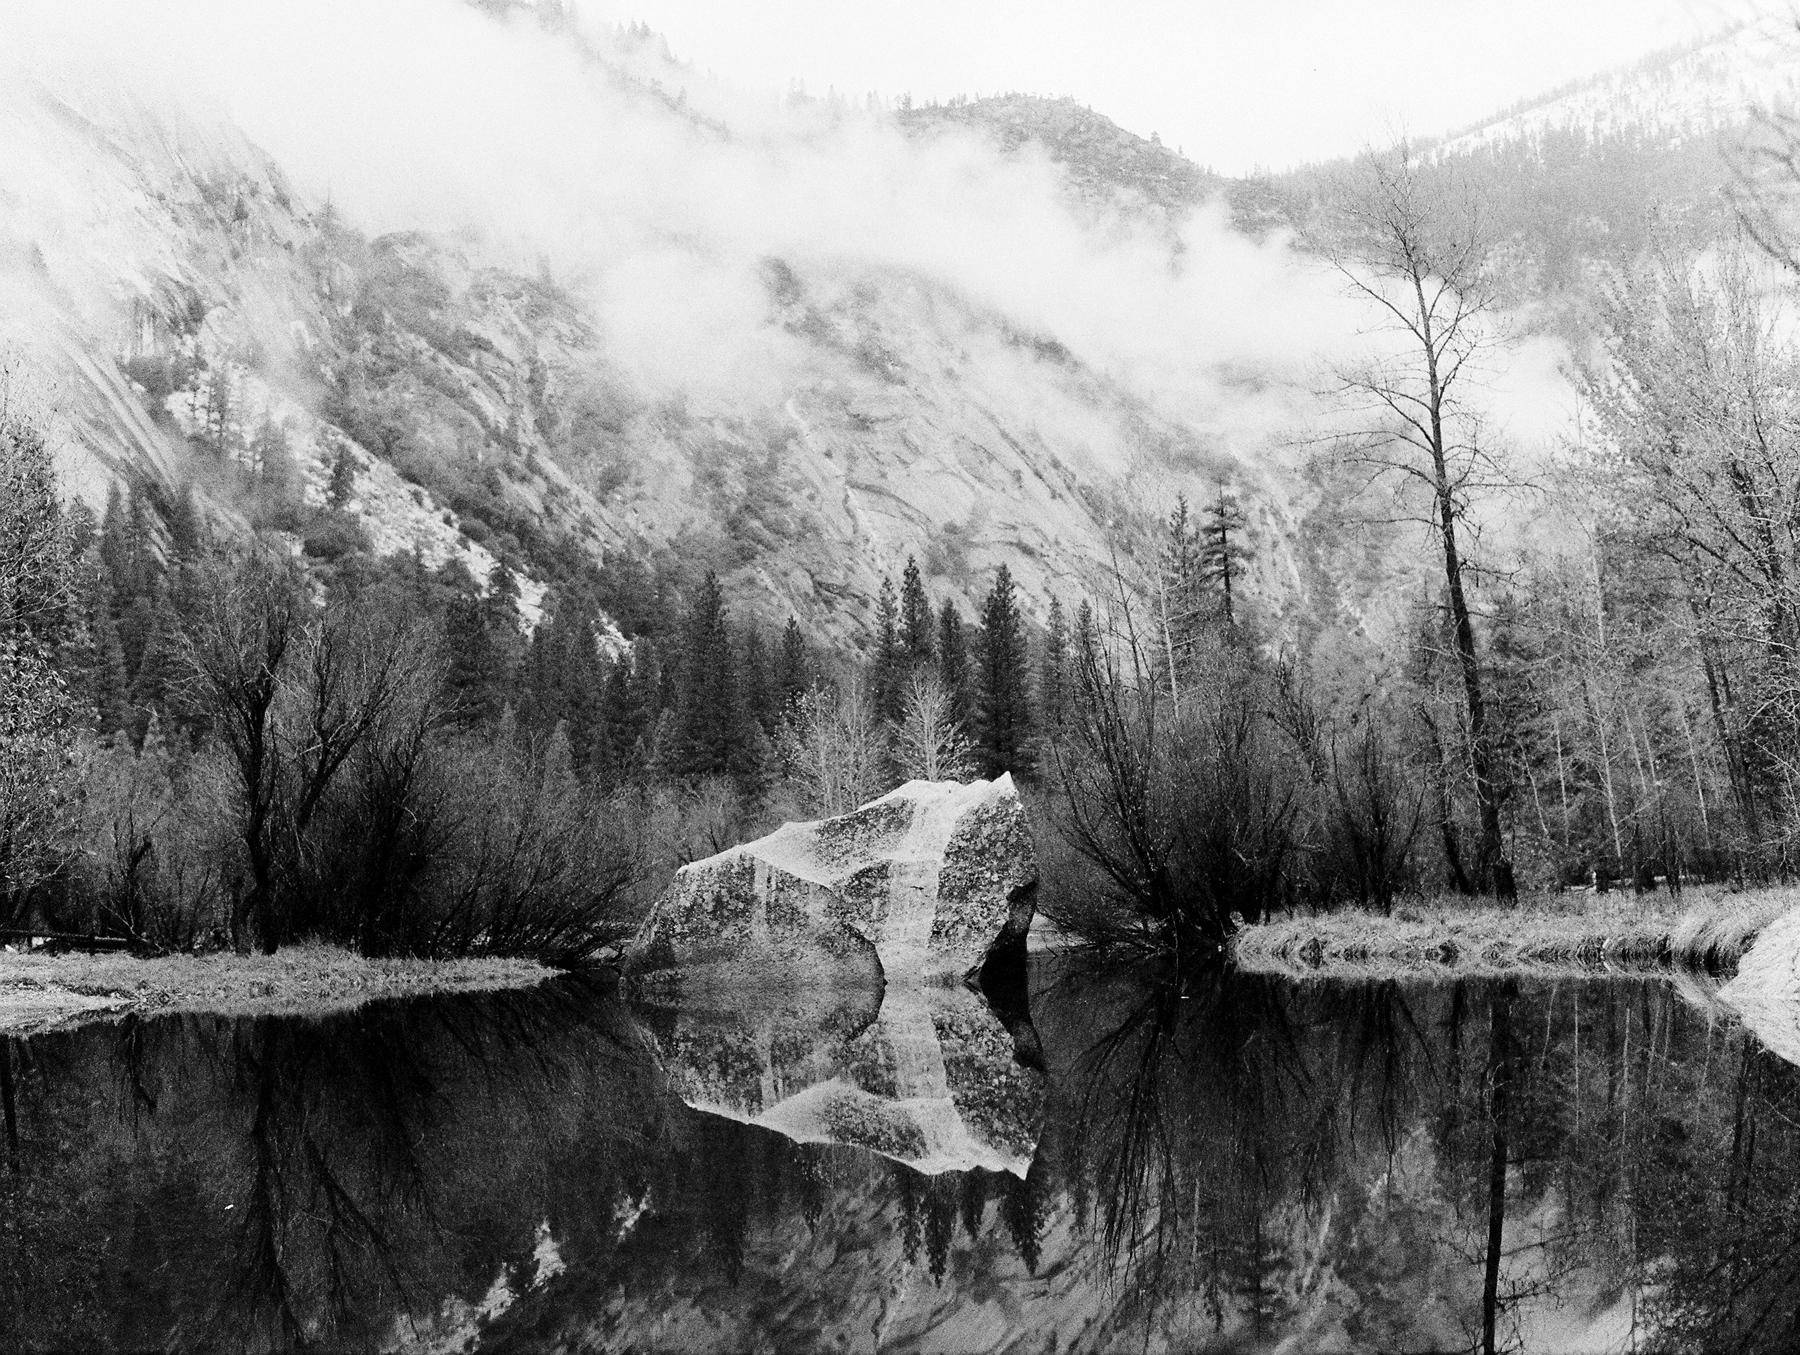 06sRGB-Inna-Kostukovsky-Yosemite4.jpg